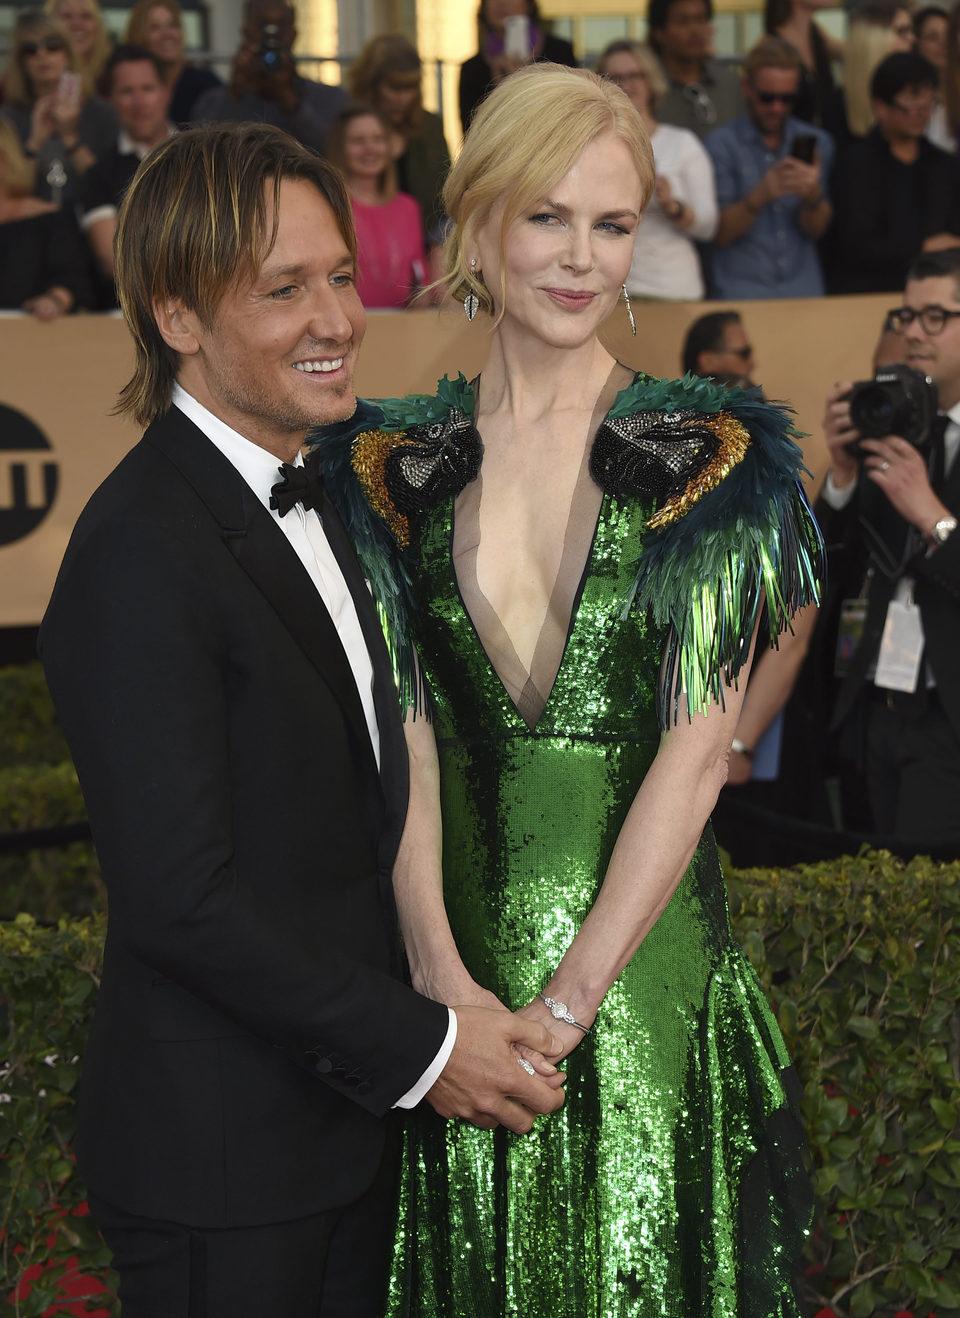 Nicole Kidman and Keith Urban on the red carpet of SAG Awards 2017